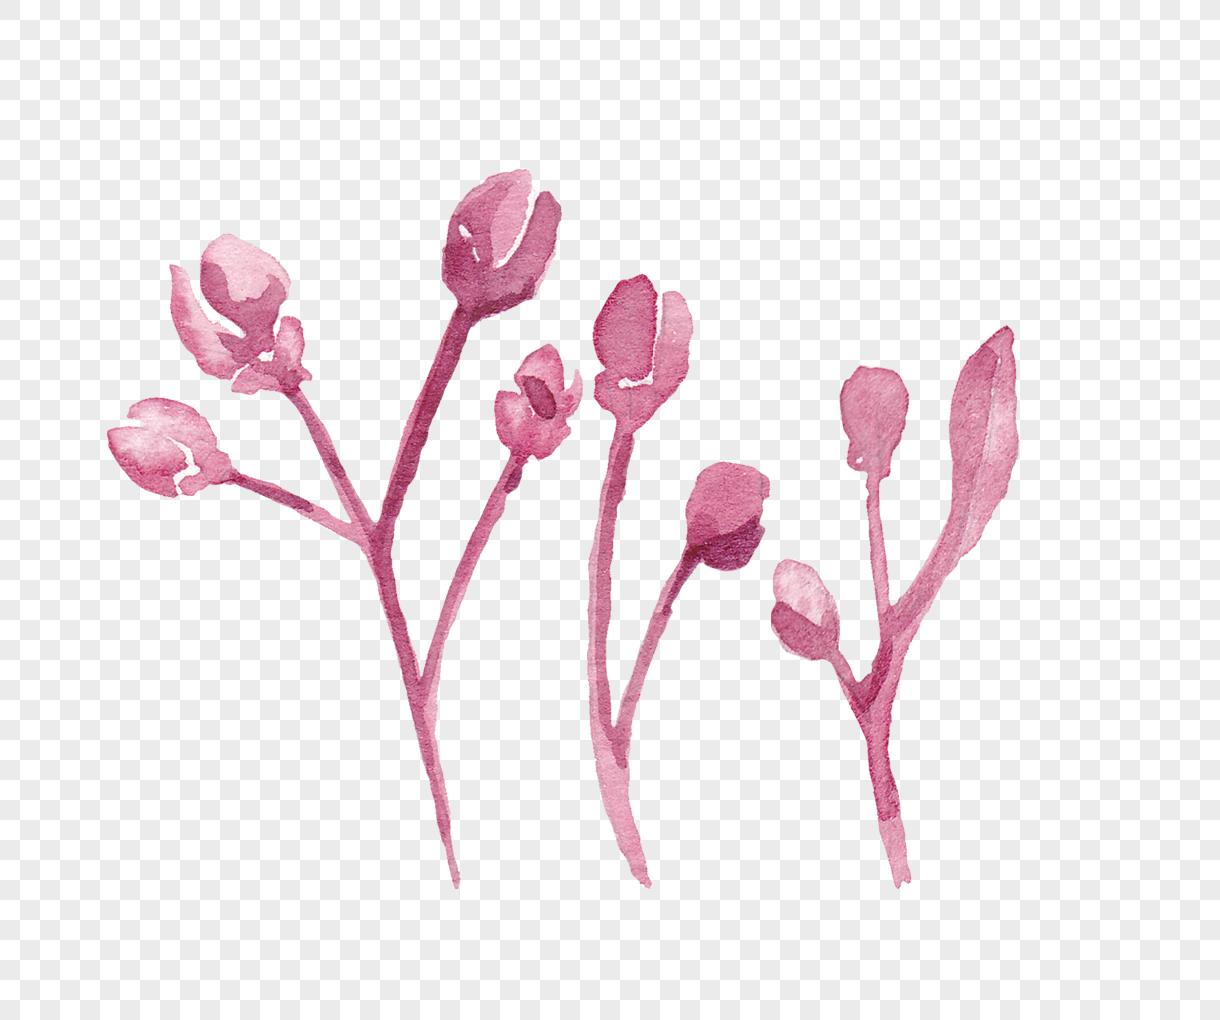 Cherry blossom peach watercolor watercolor material